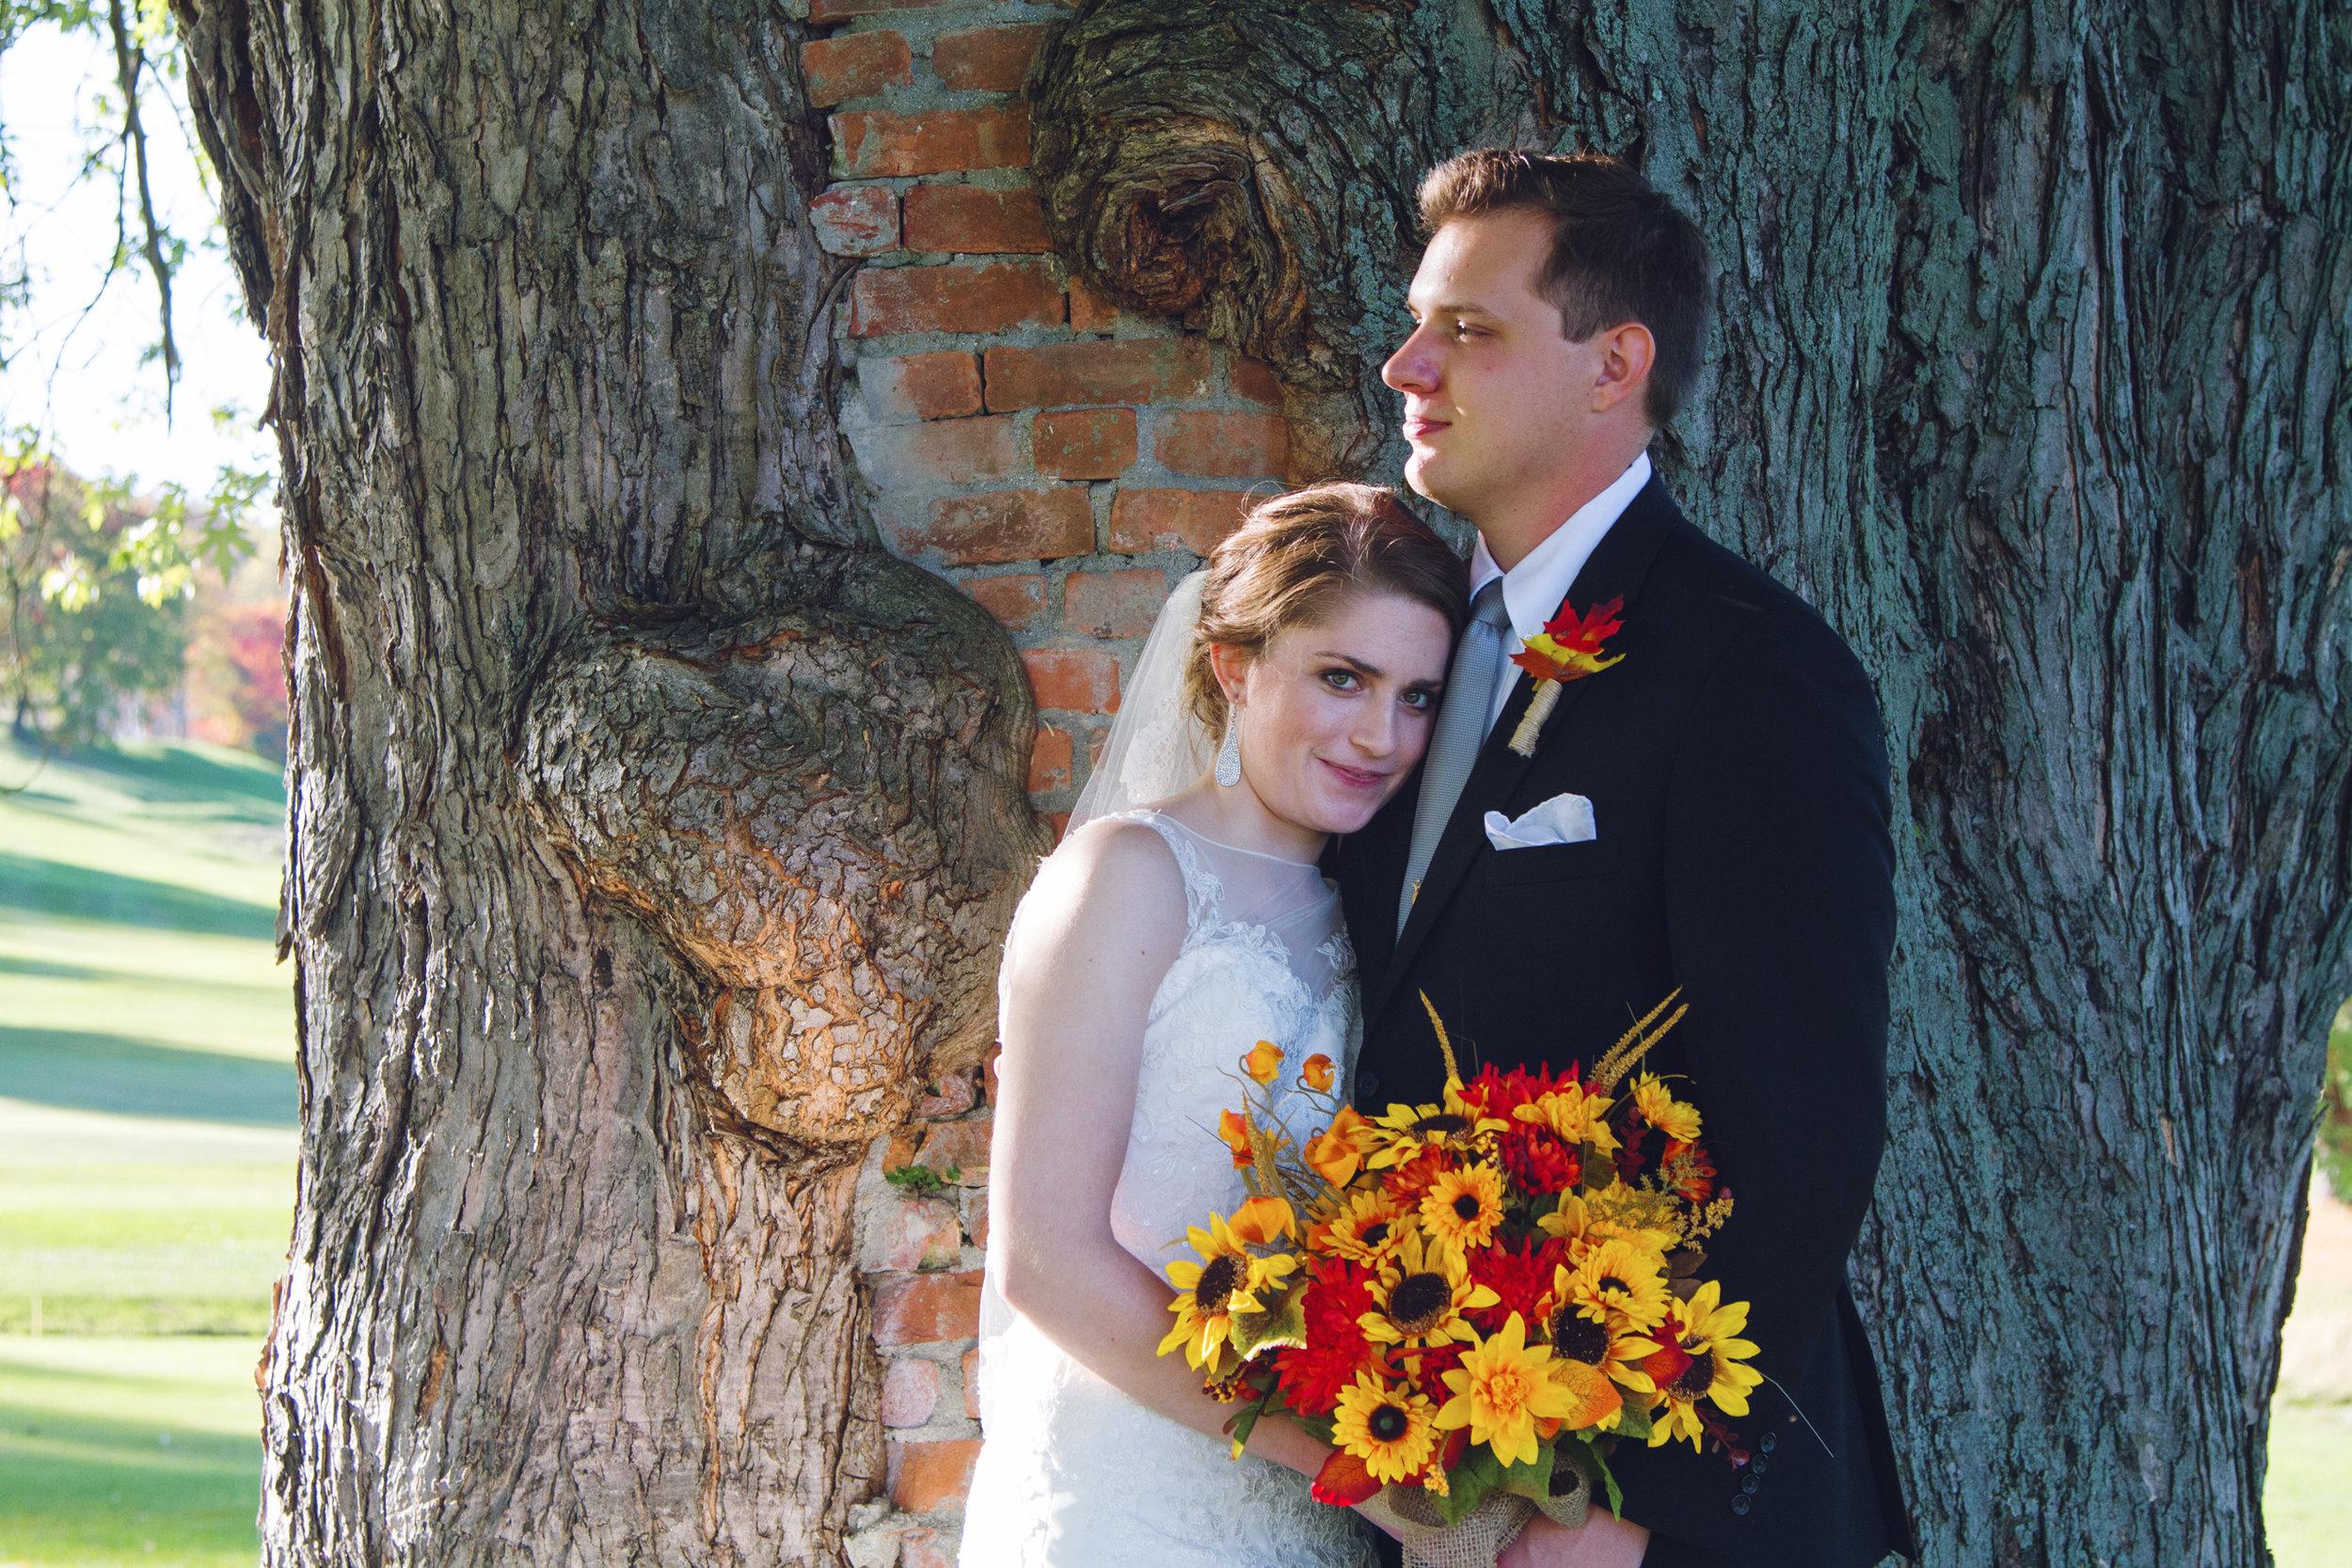 Chris&Erin_Tree_Closeup.jpg